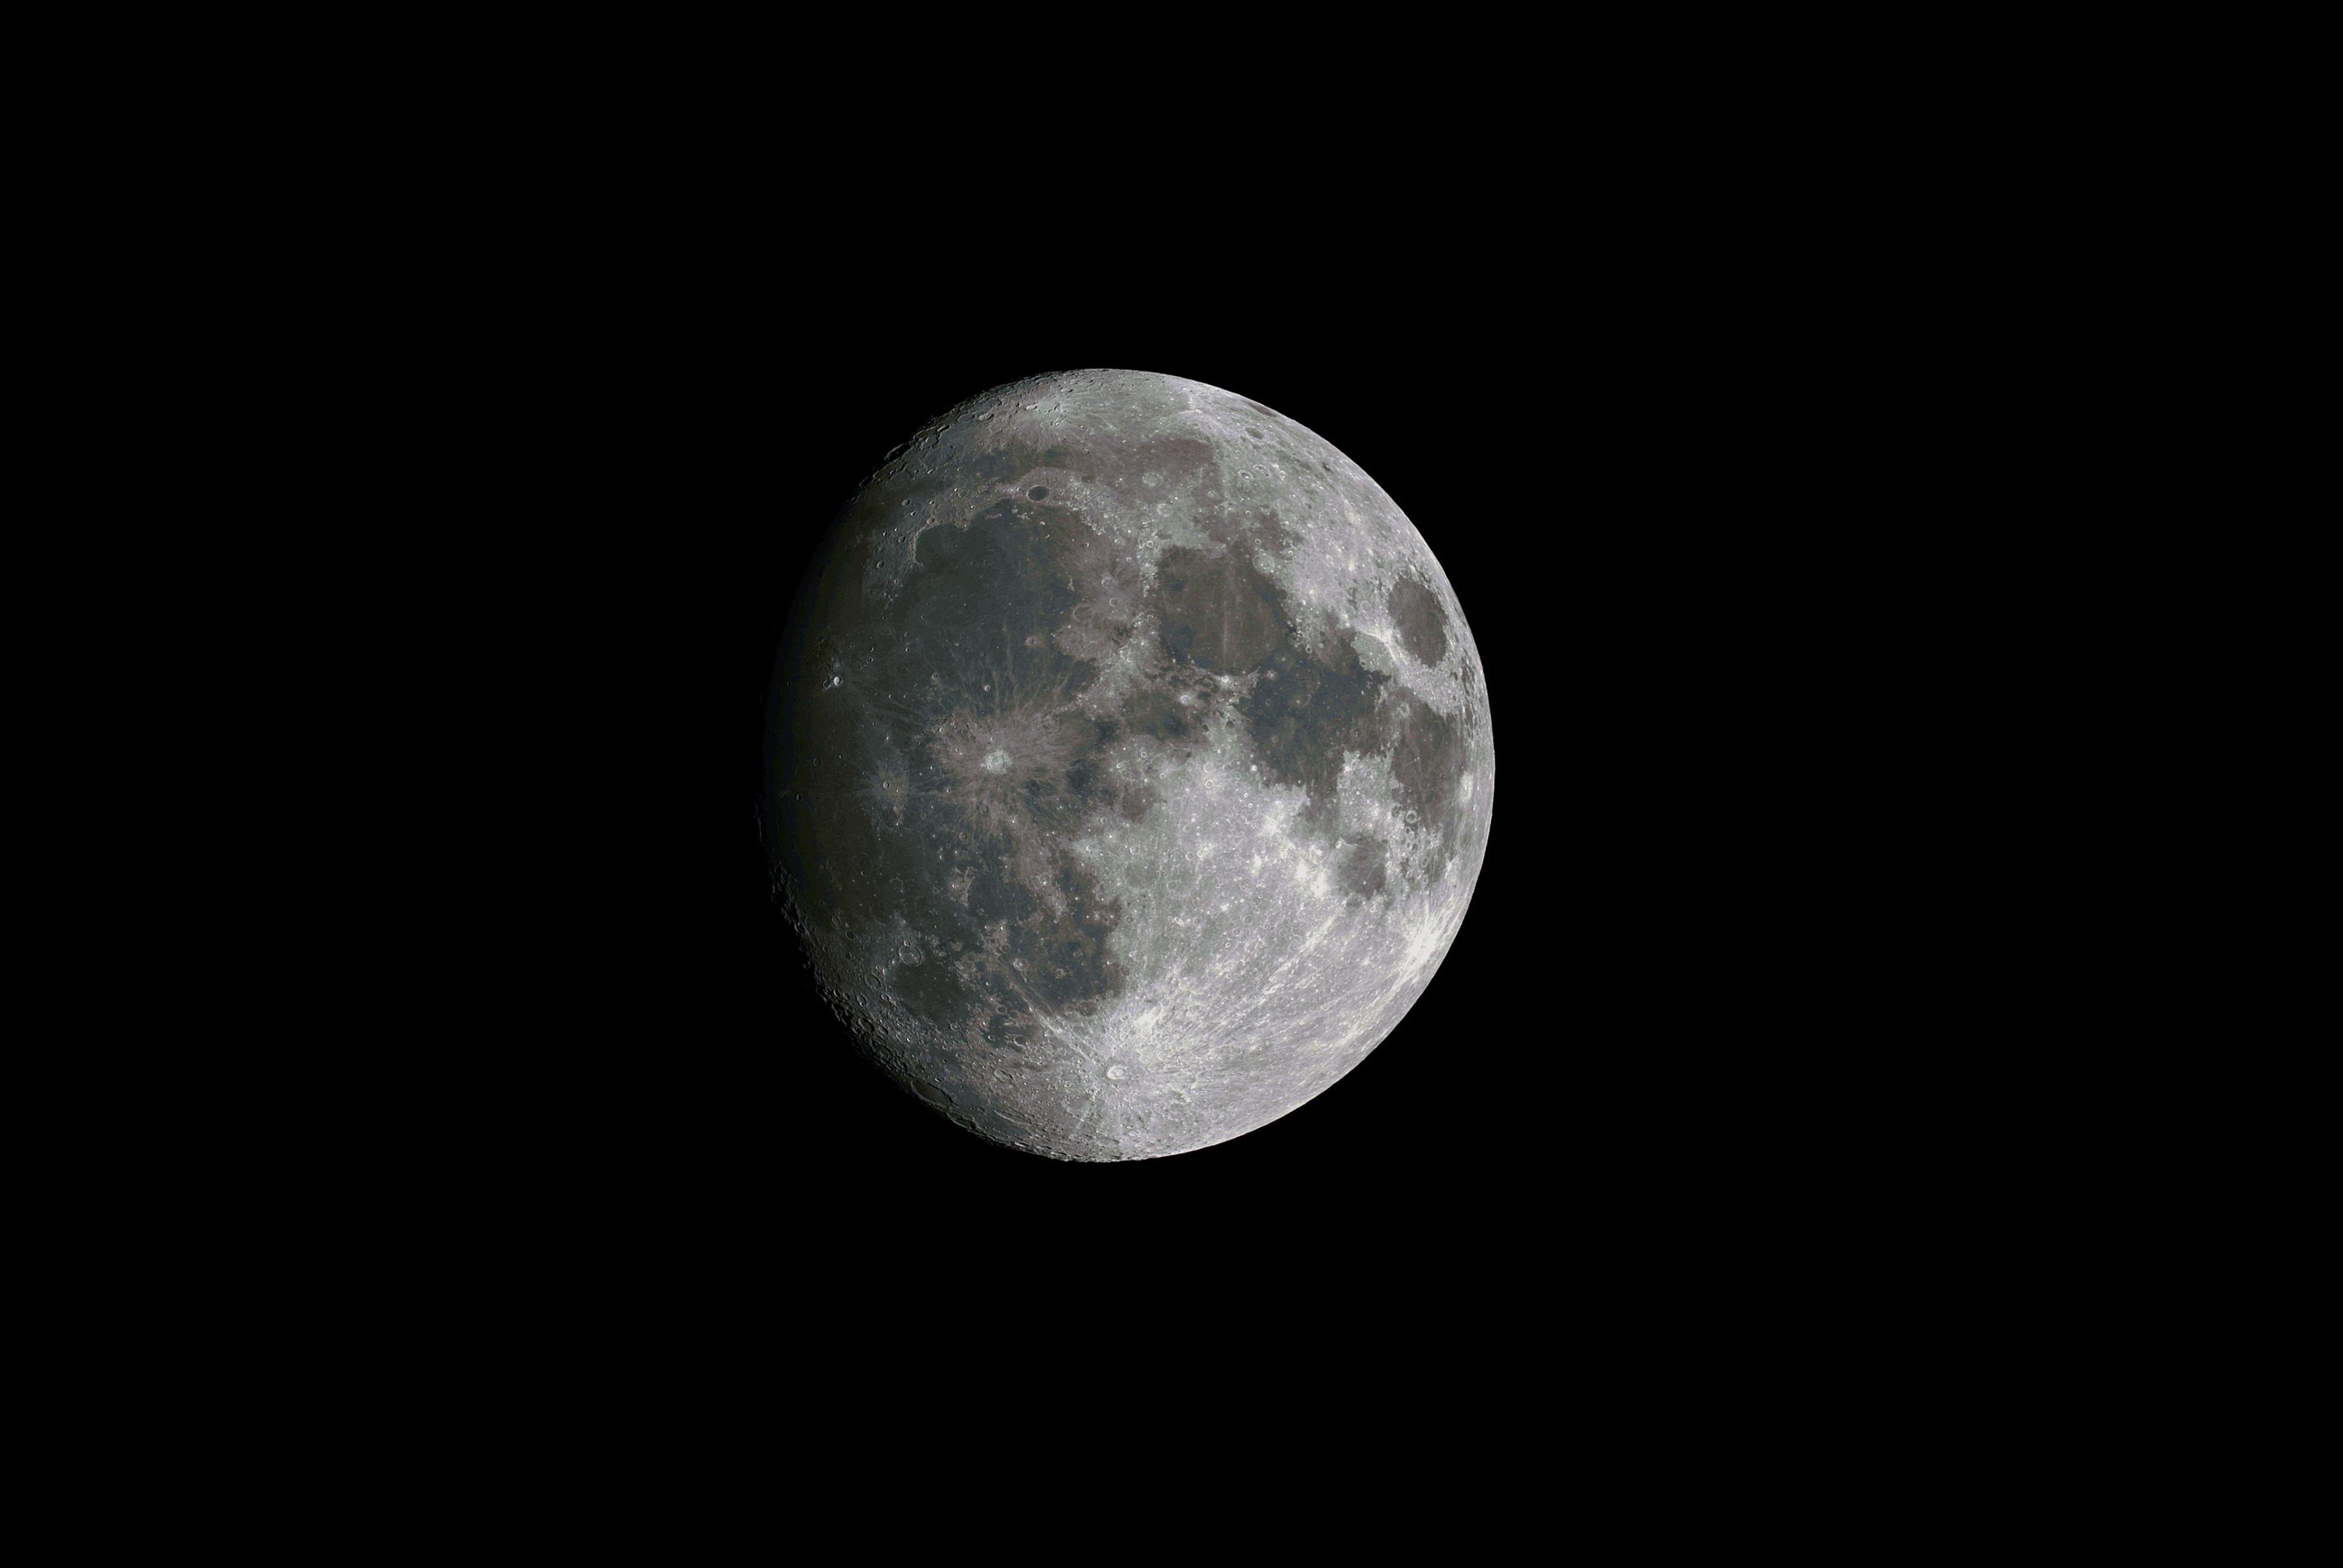 Lune_c8_6.3_a7s.jpg